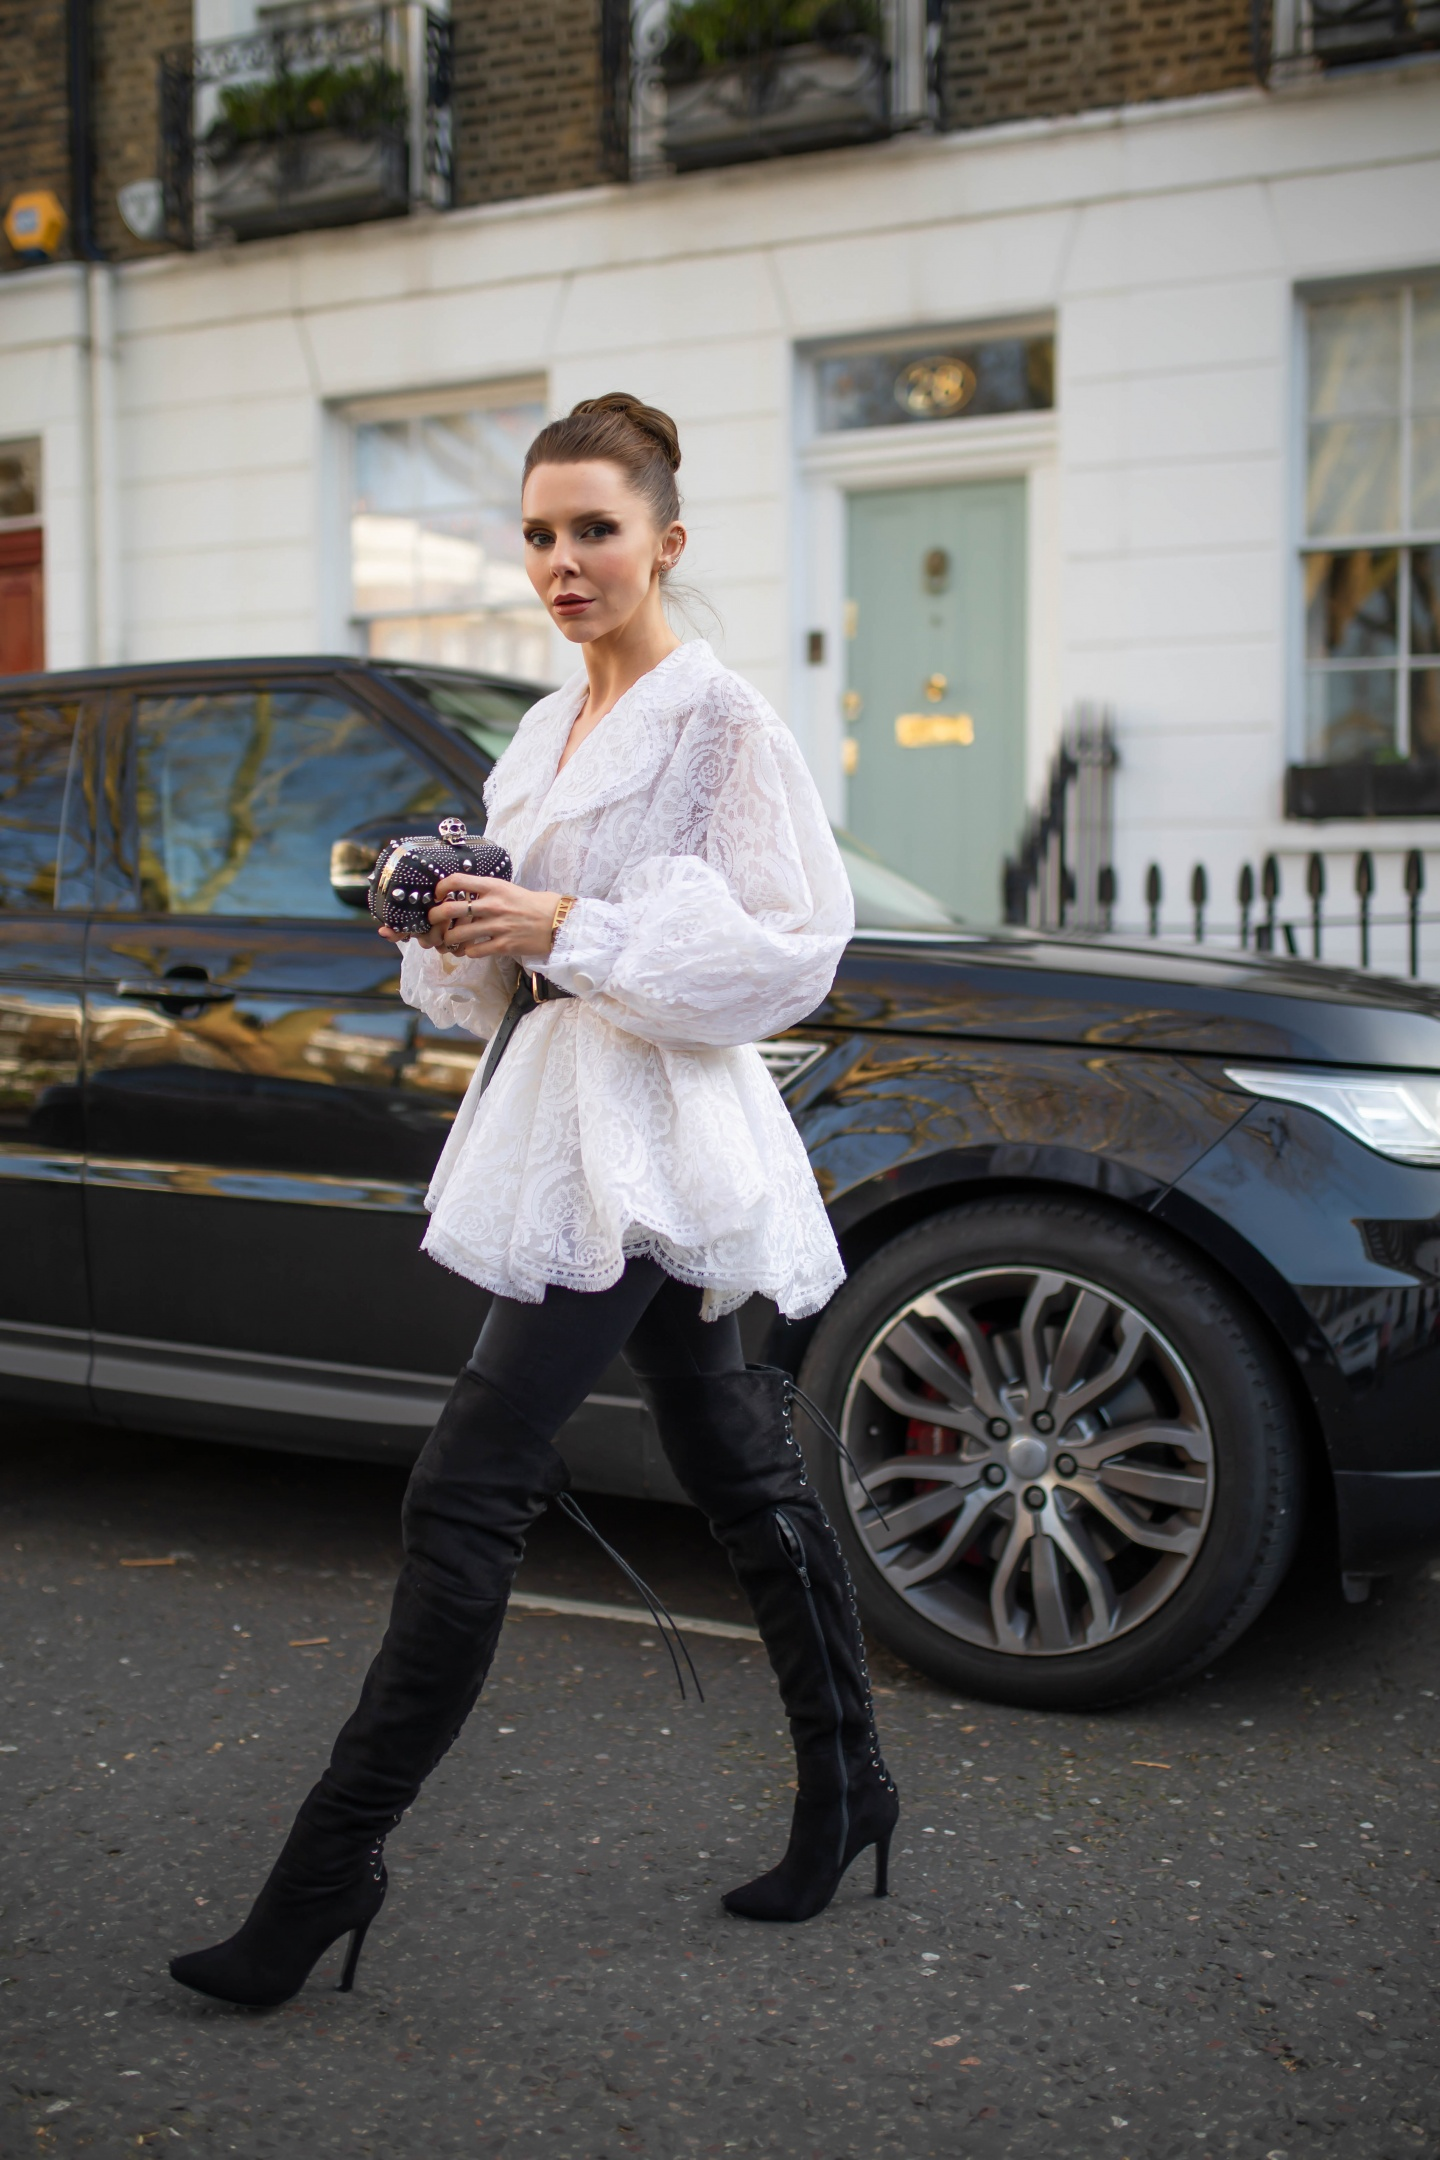 london fashion week, lfw, london fashion week street style, fashion, ss19, alexander mcqueen, christian dior, vintage dior, dior , vintage dior blouse, designer exchange